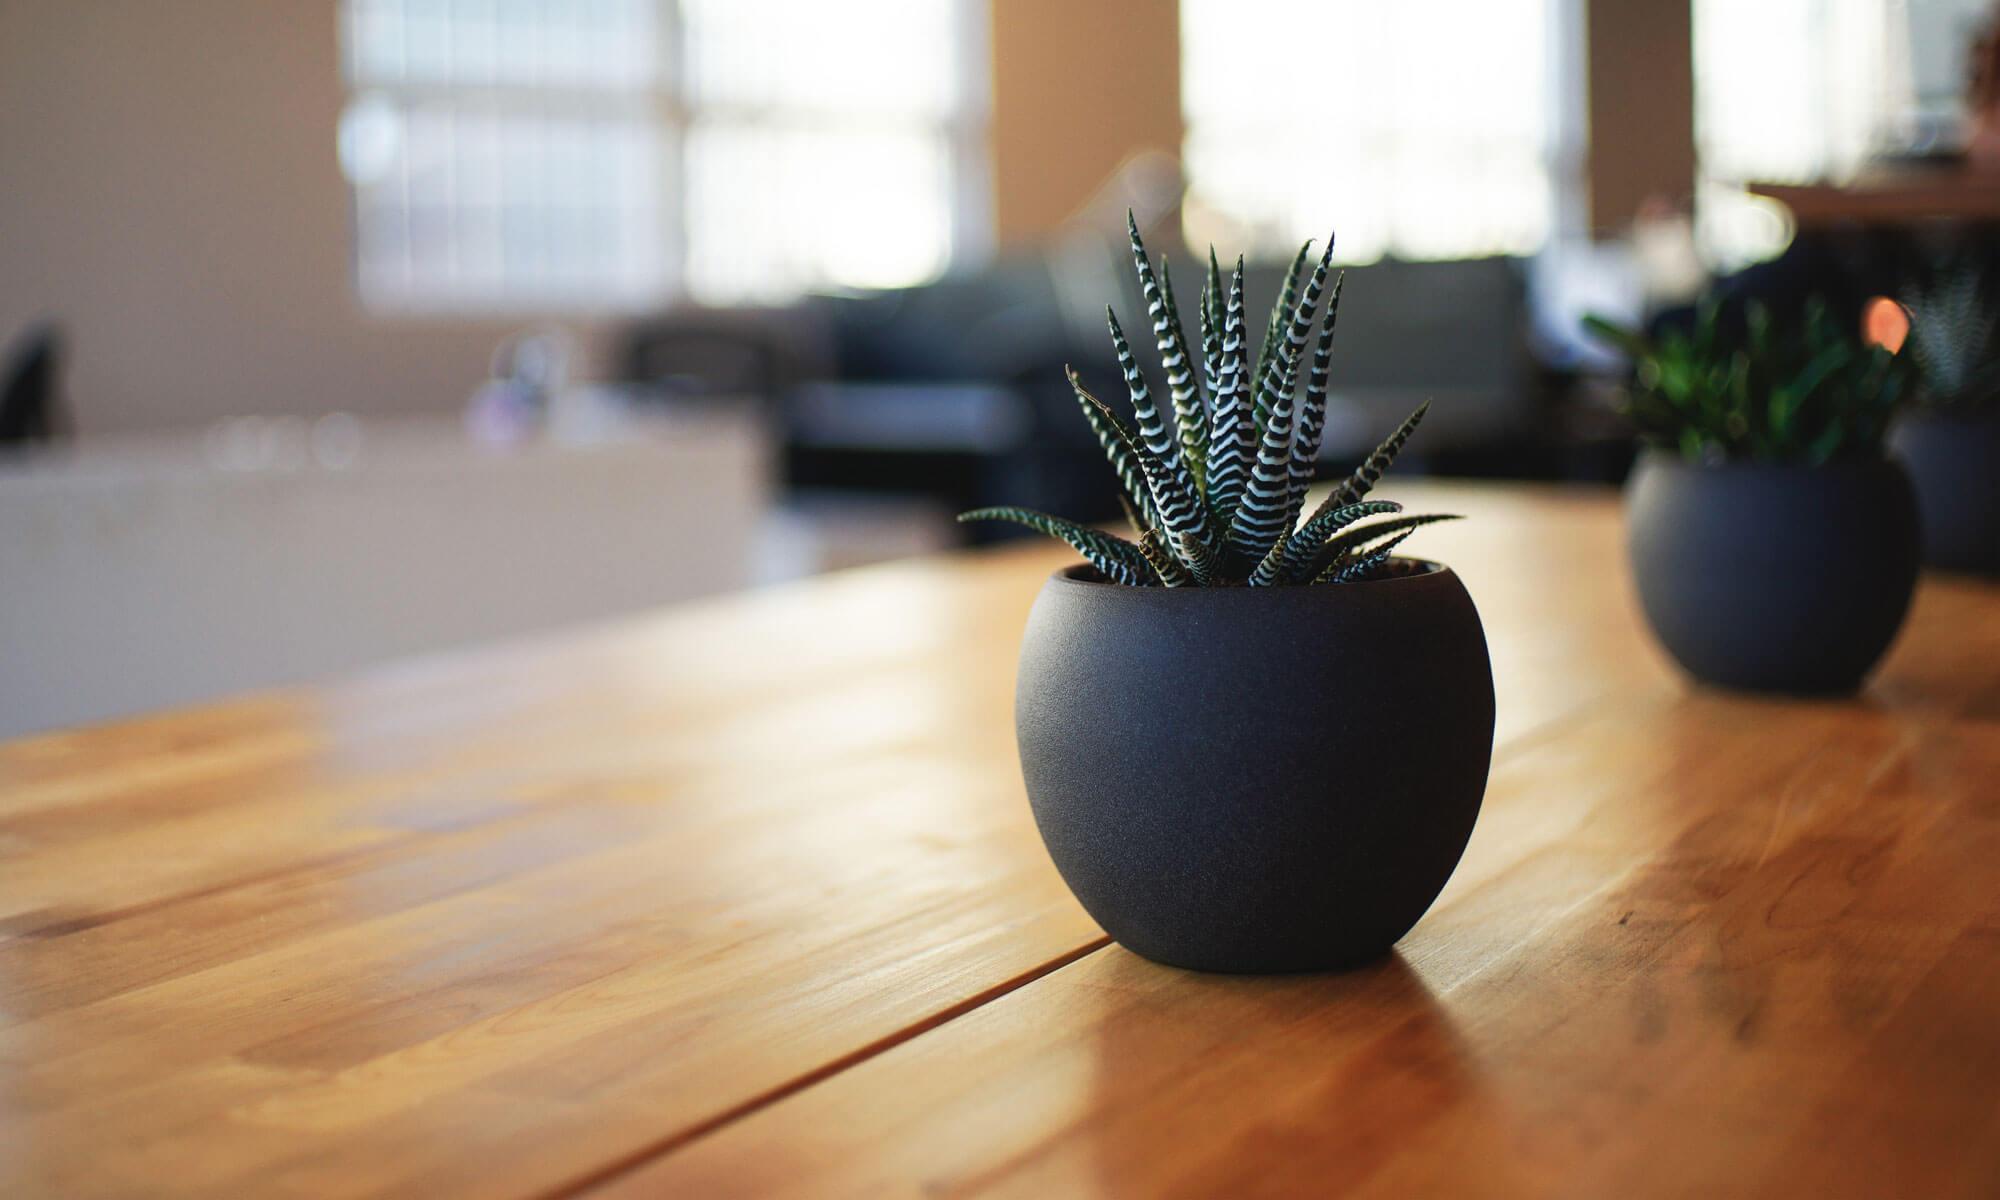 SEEDPLACE(シードプレイス)- 多摩地域の次世代の共創型シェアオフィス